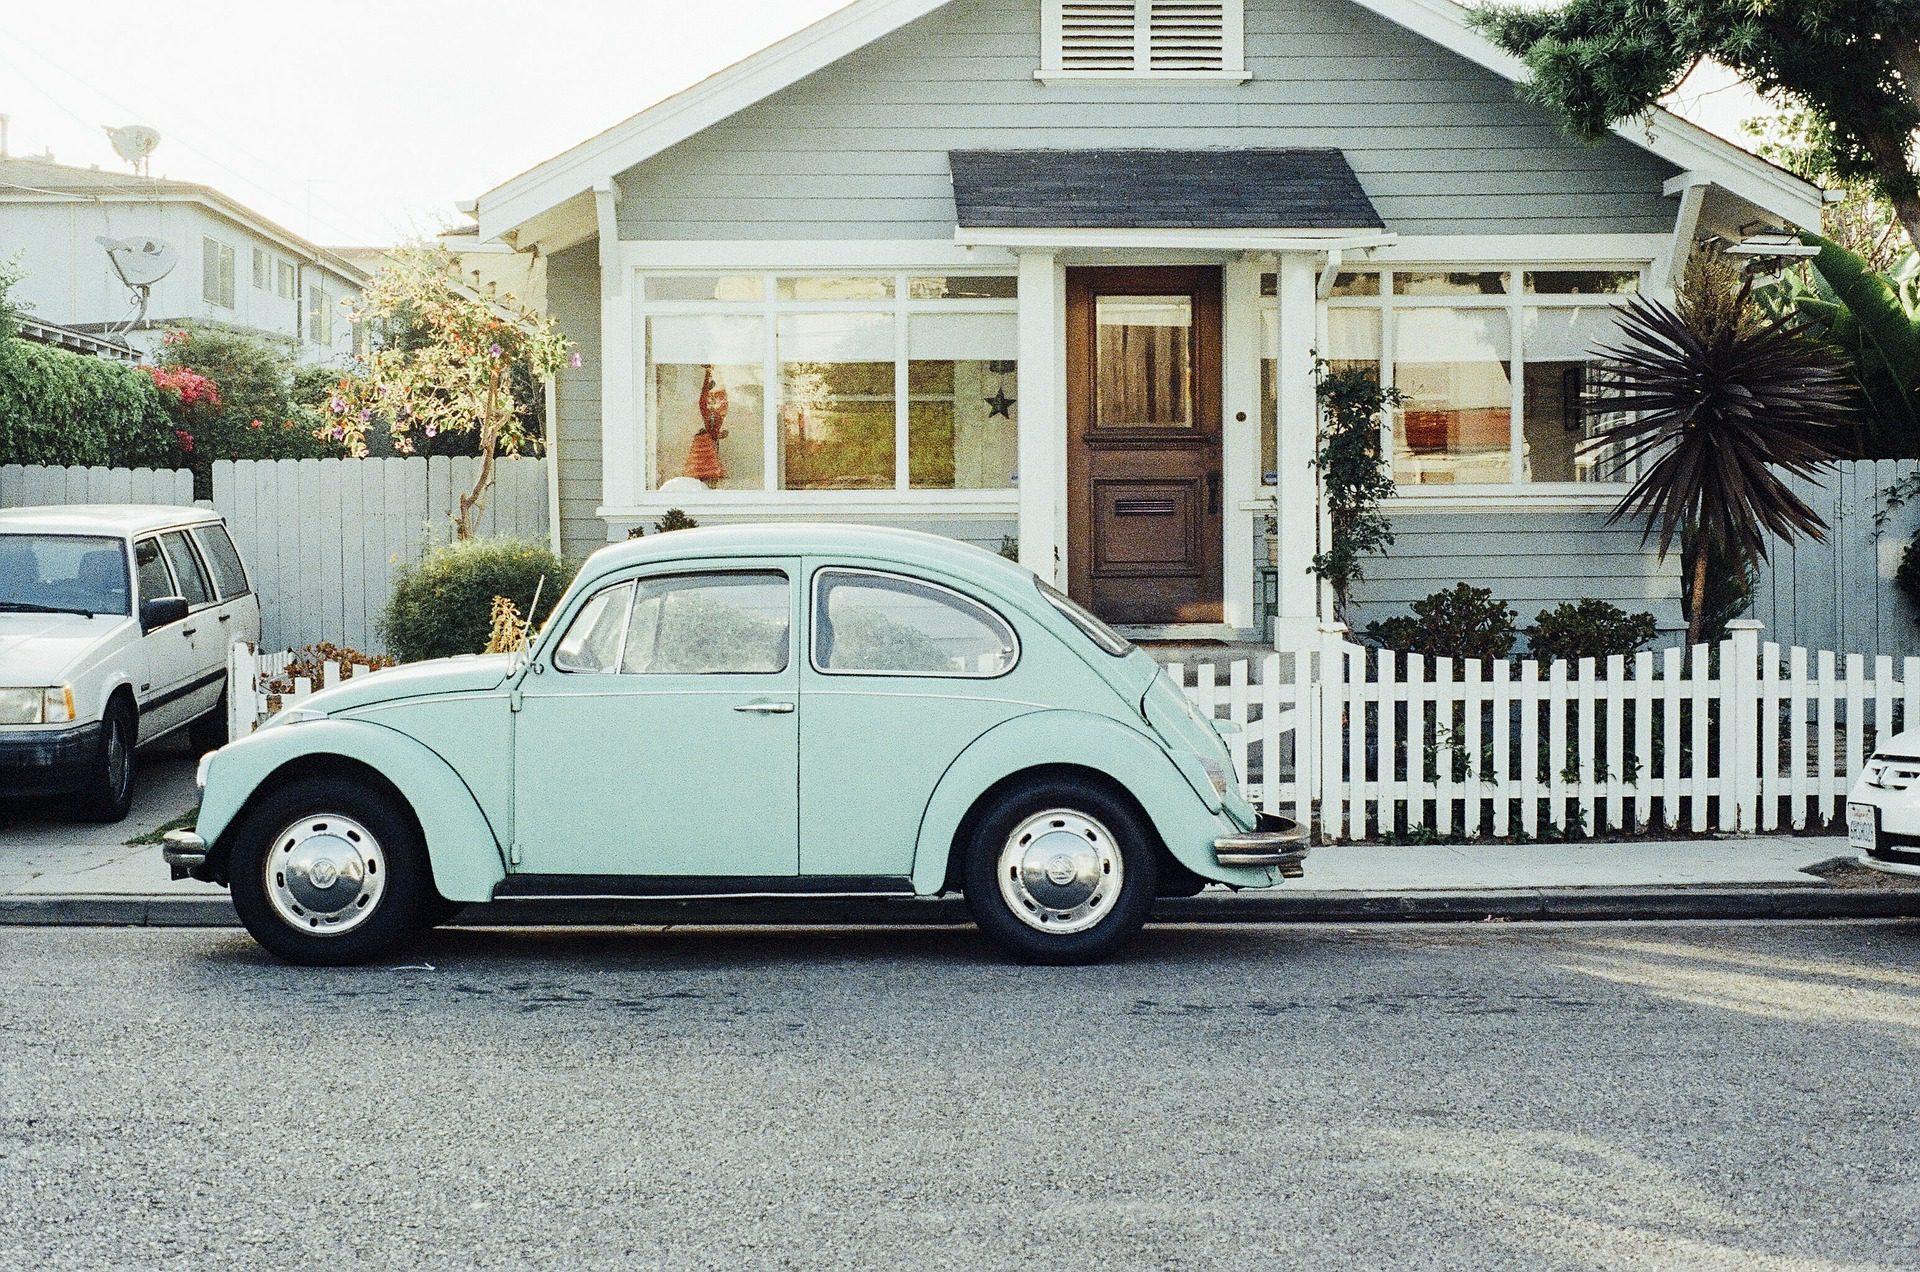 I Inherited a House – What Should I Do?